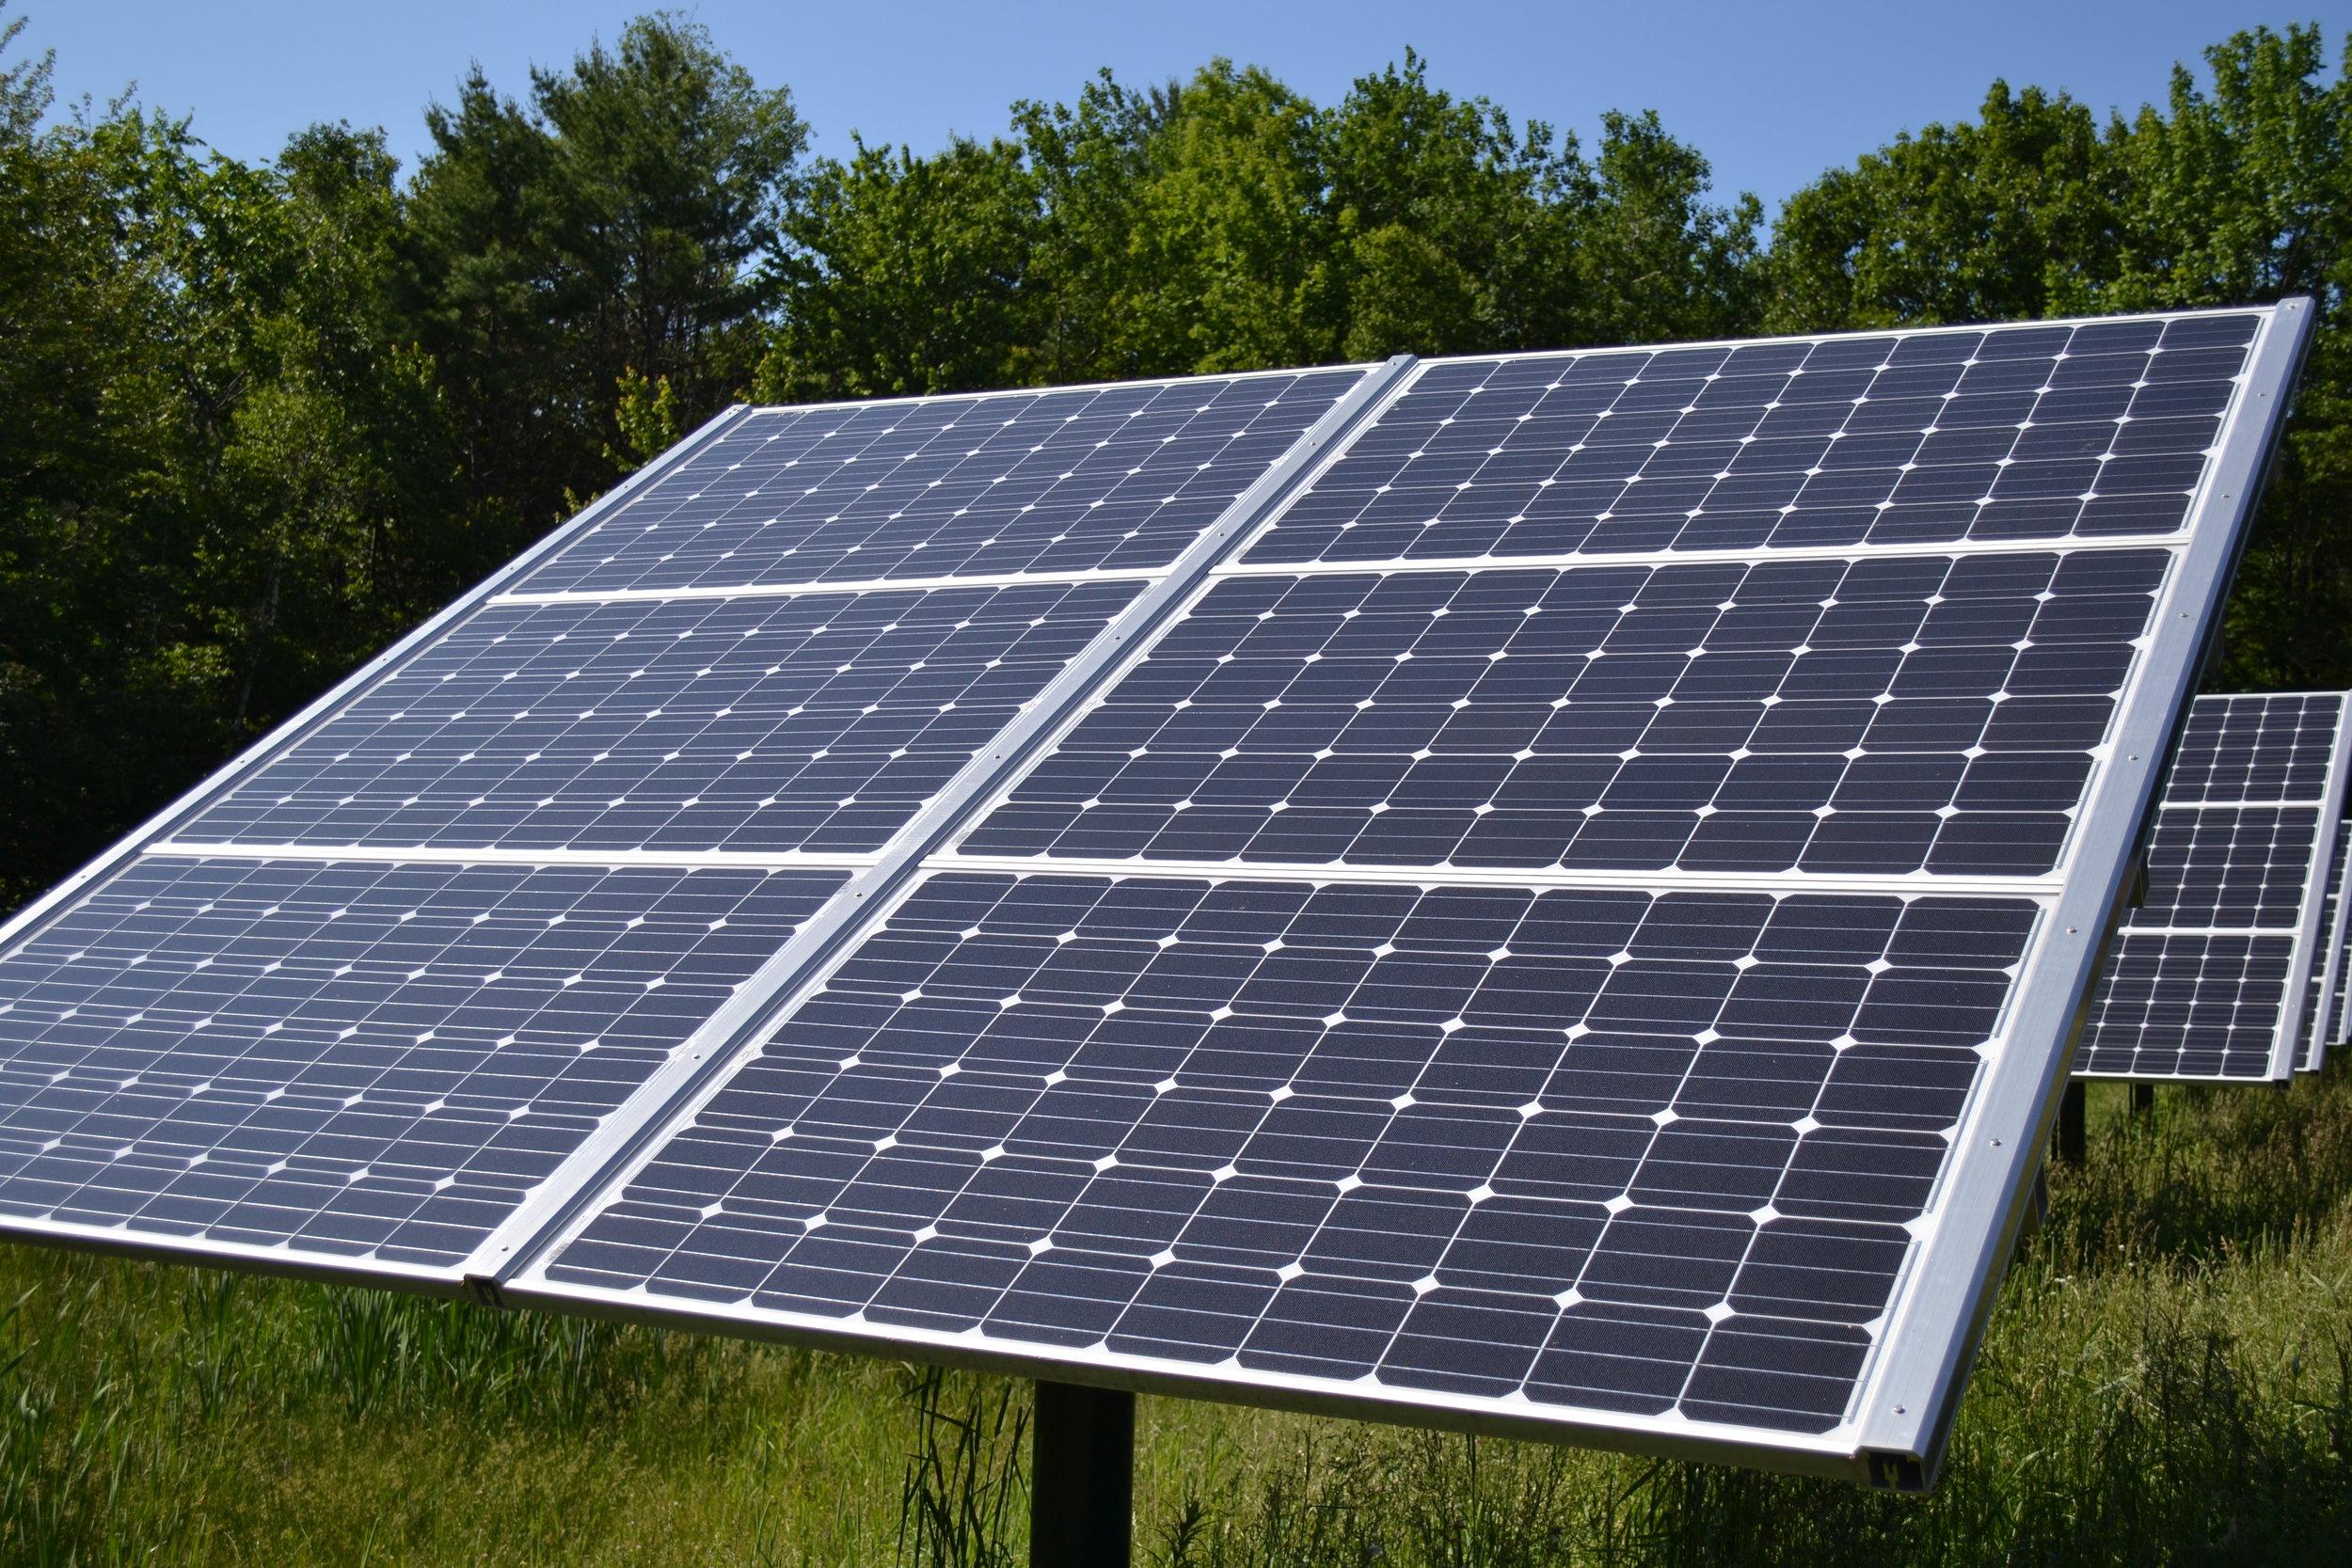 Fixed tilt solar array similar to those to be installed at Dublin School.